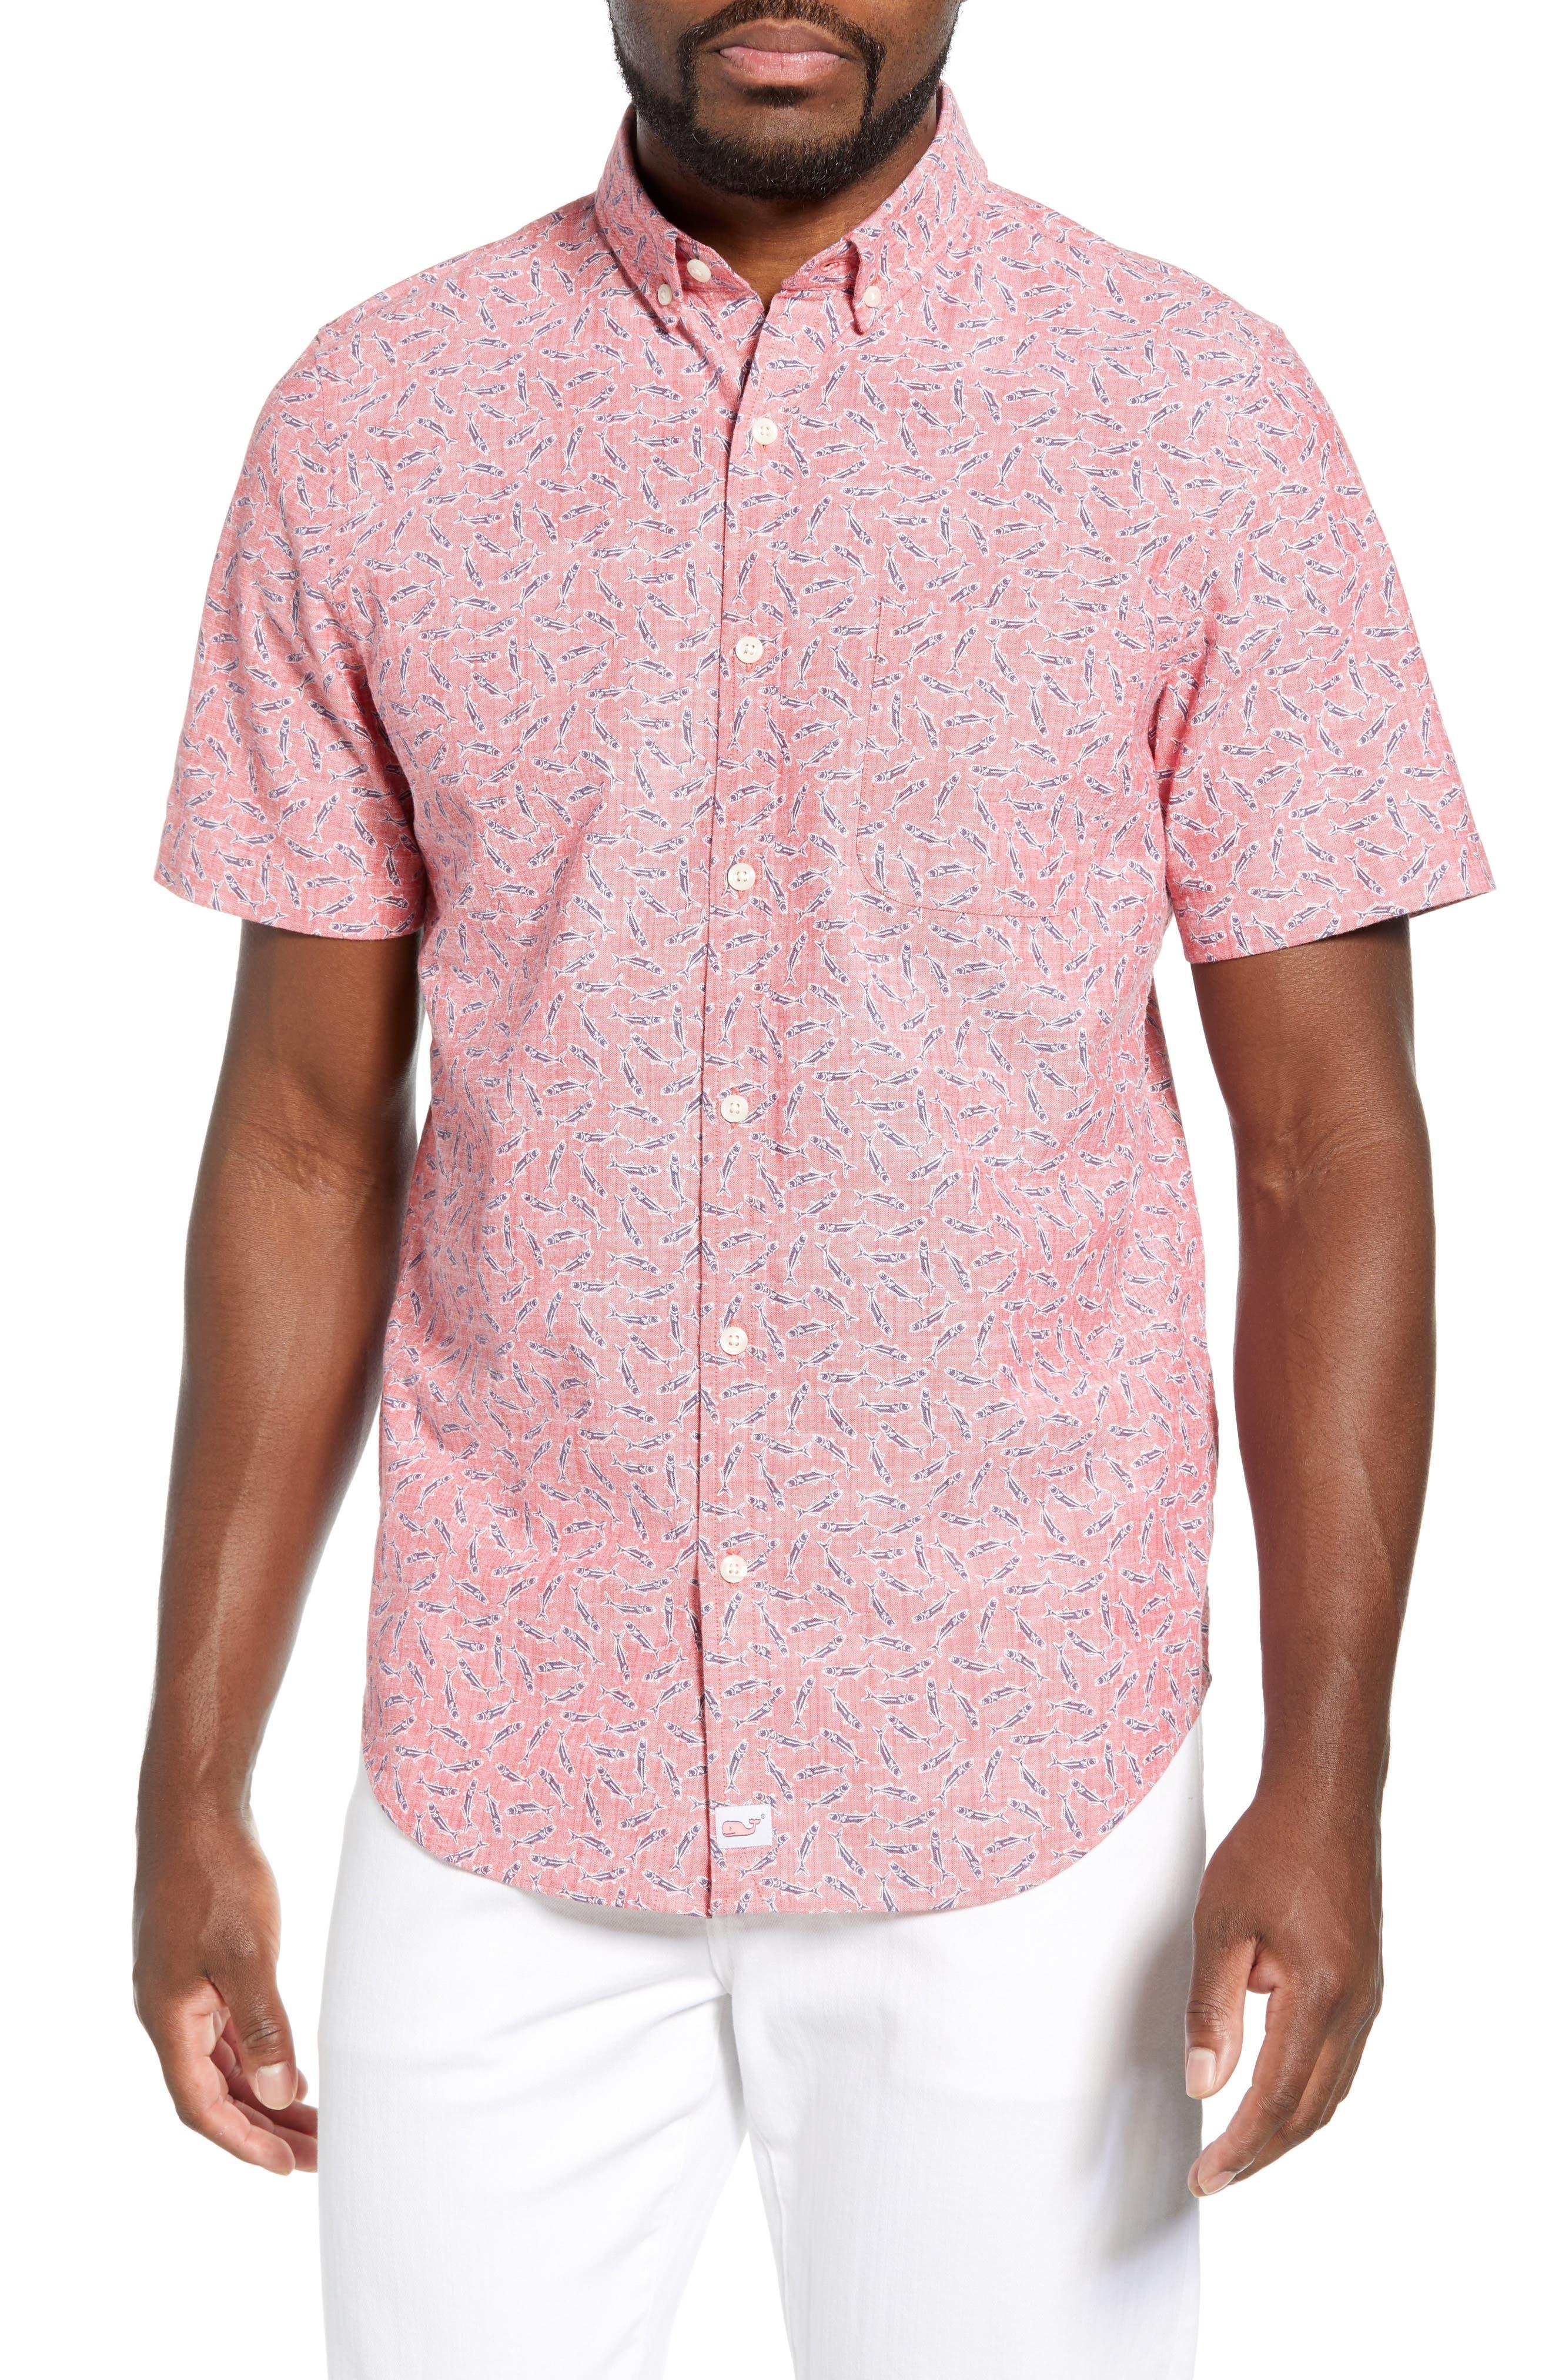 VINEYARD VINES, Murray Slim Fit Sport Shirt, Main thumbnail 1, color, 652